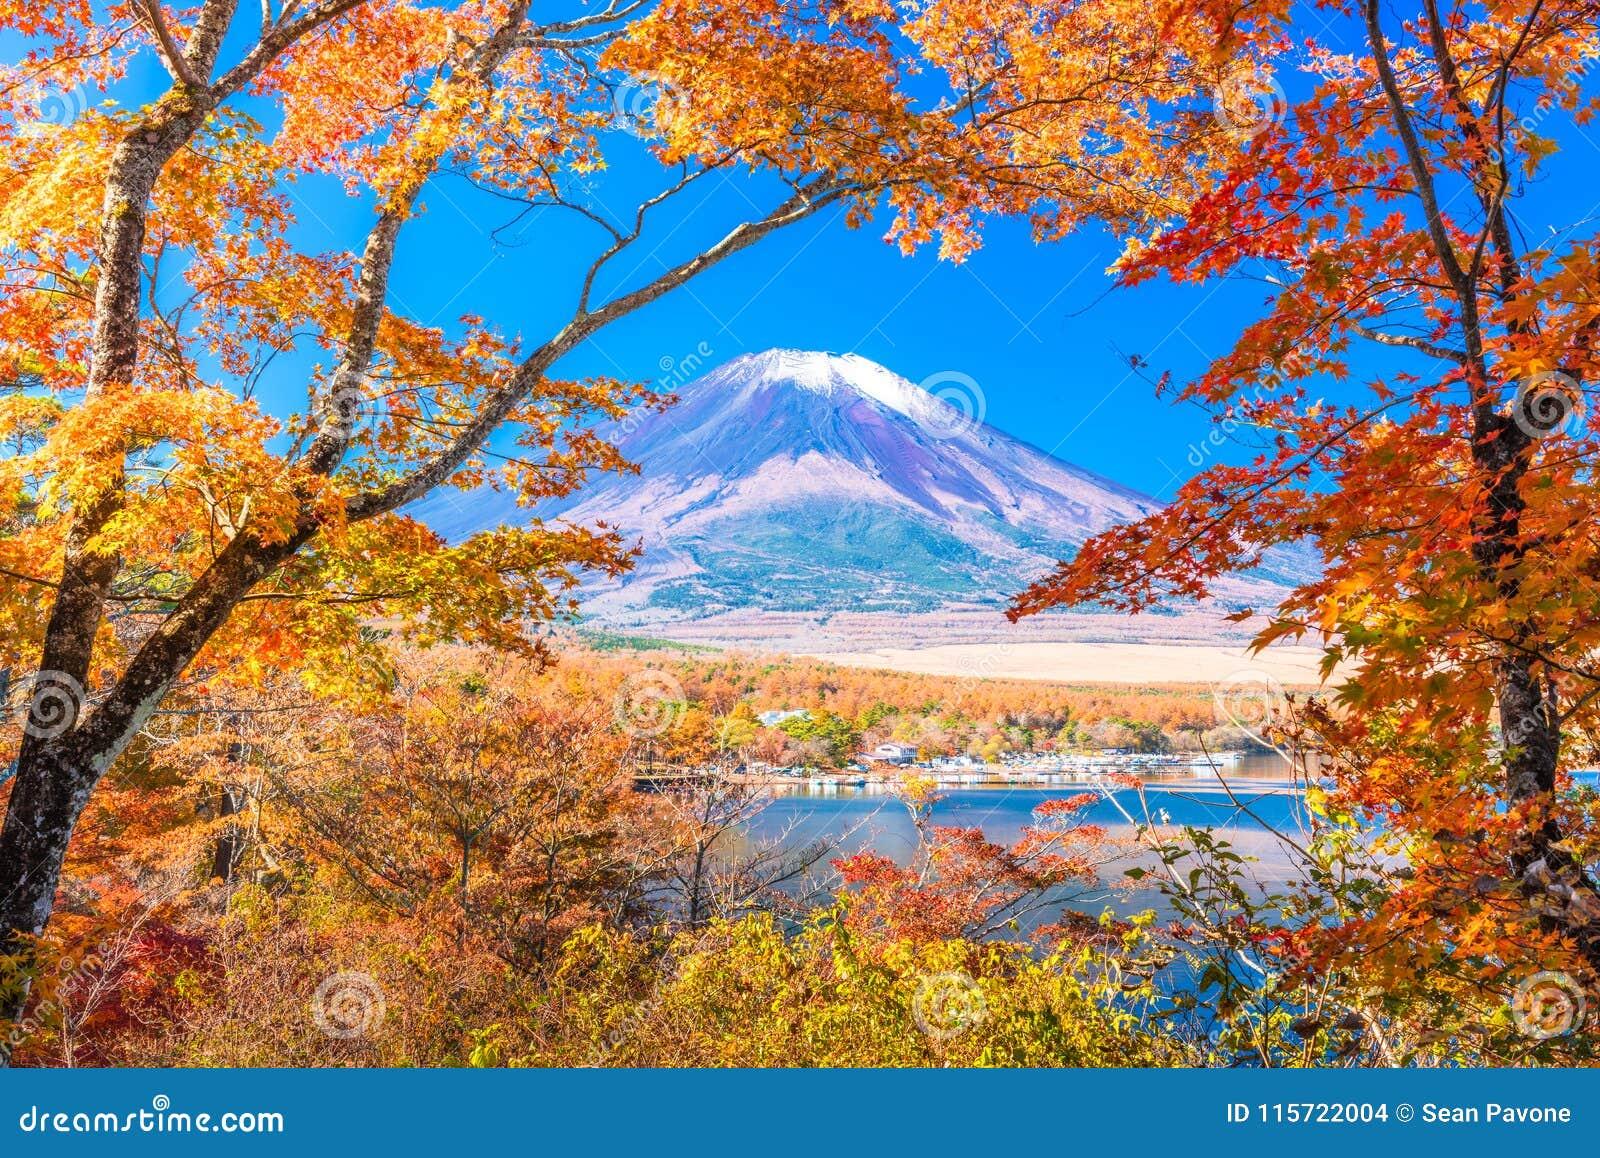 MT Fuji, Japan Autumn Landscape